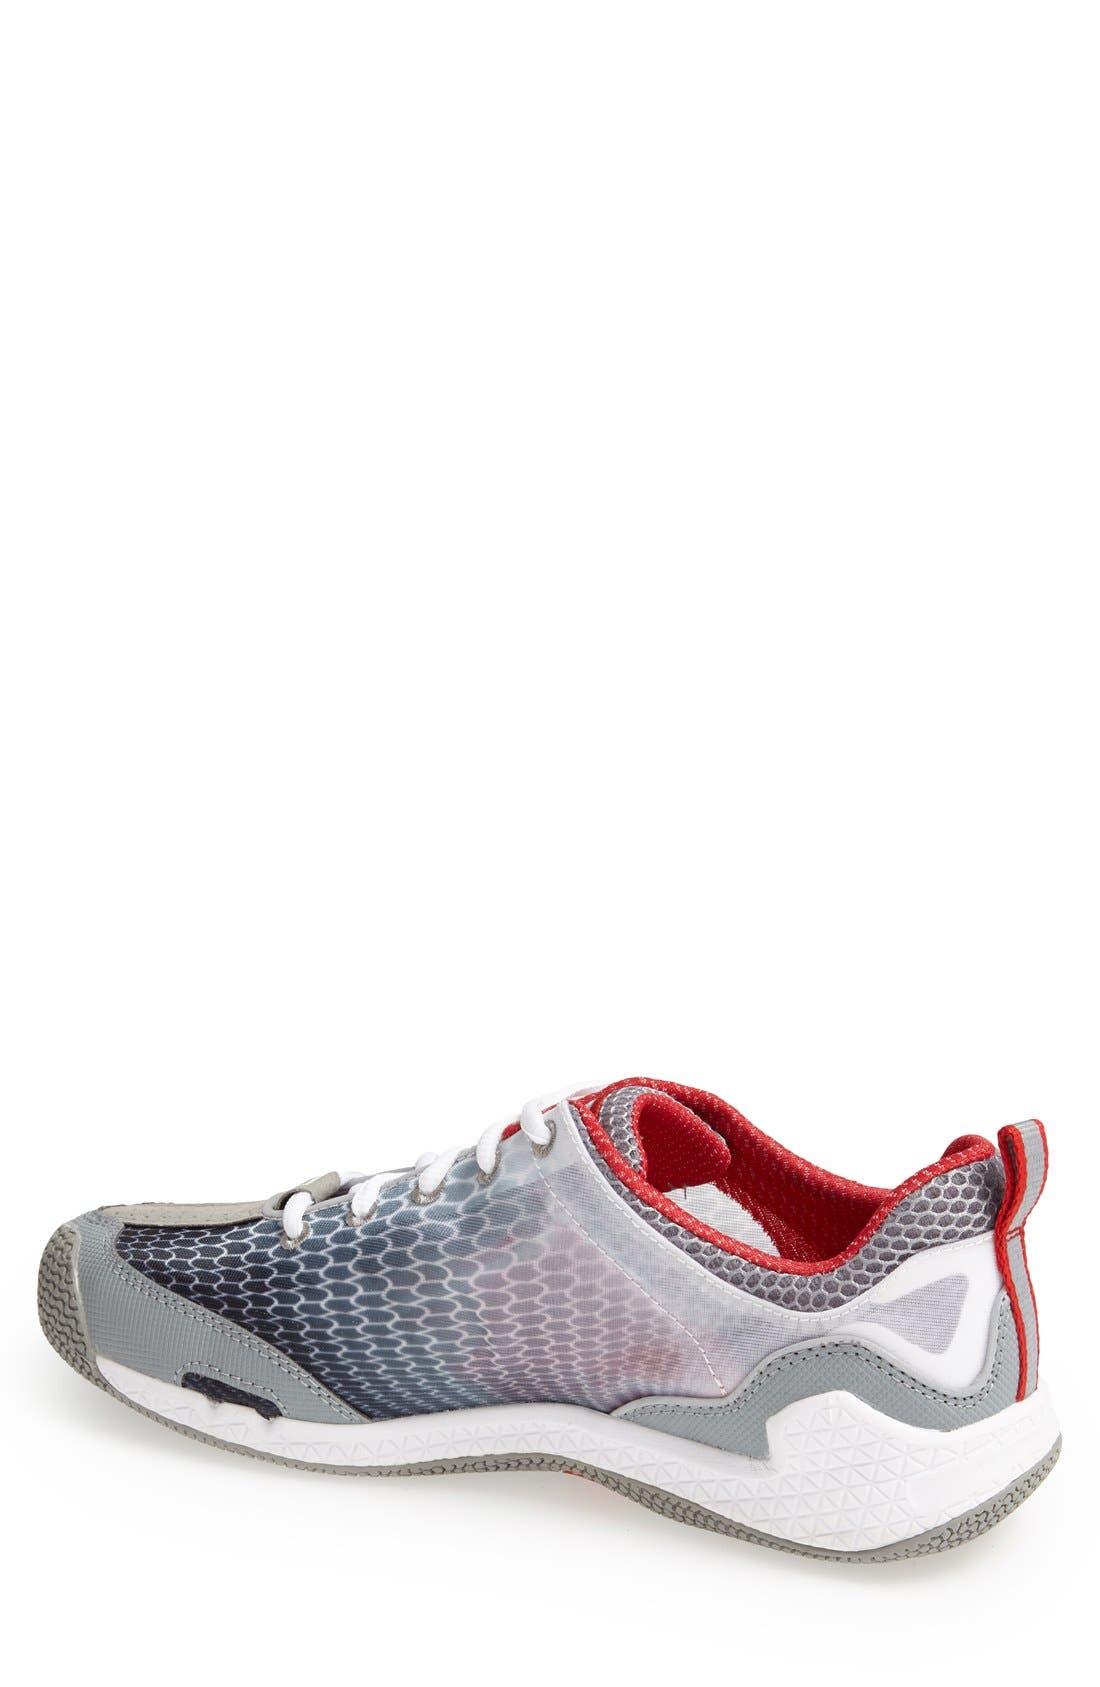 Alternate Image 2  - Sperry 'Sea Racer' Training Shoe (Men)